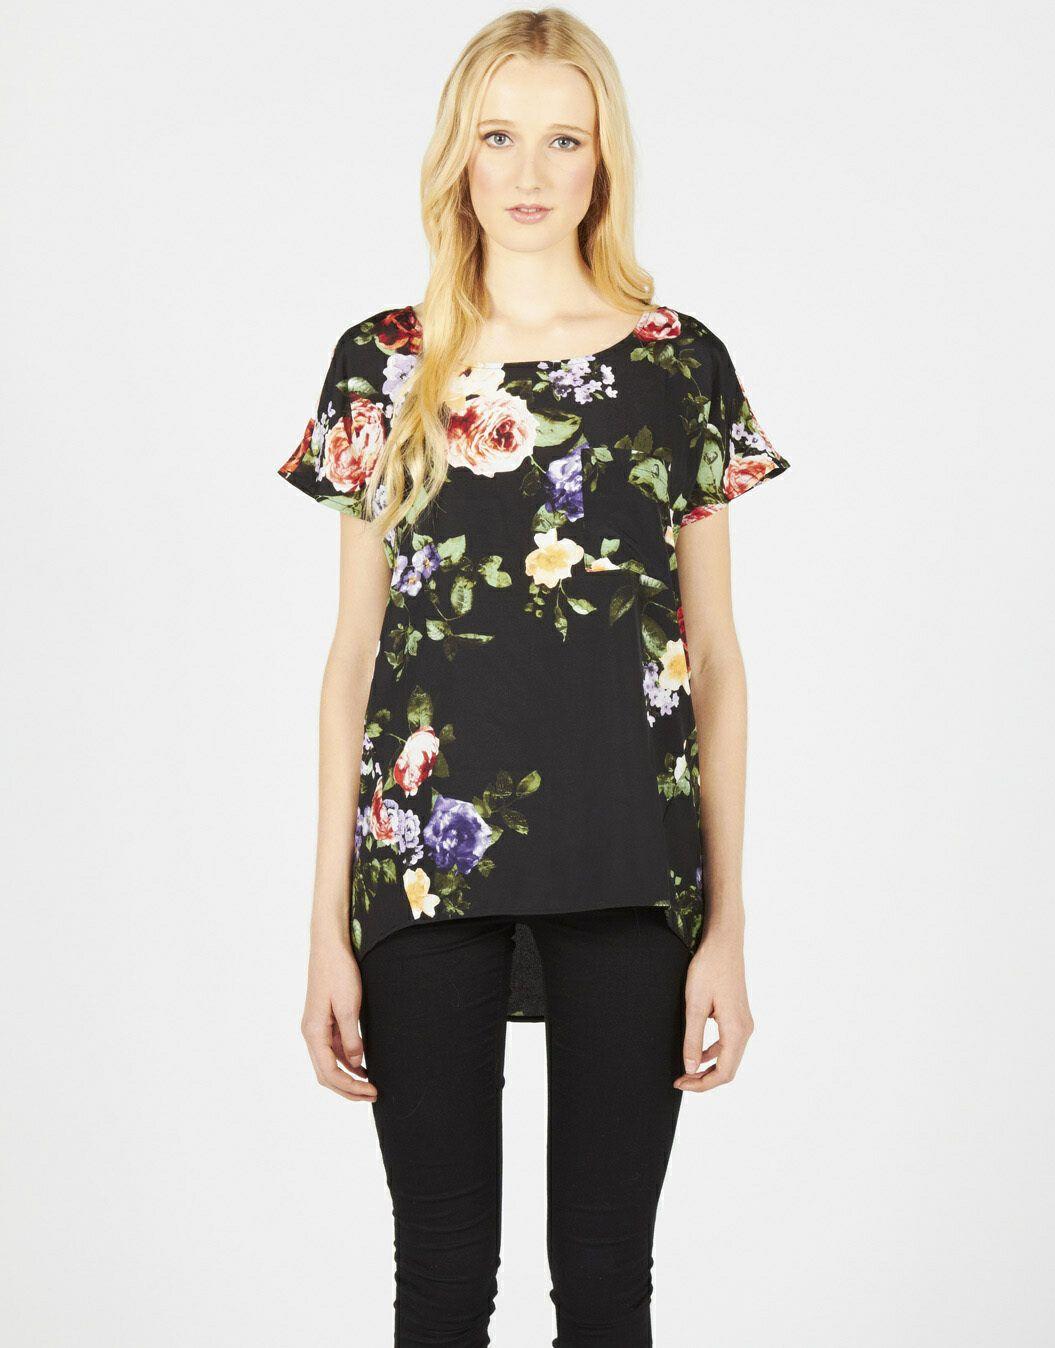 Glassons | Fashion, Floral tops, Fashion store